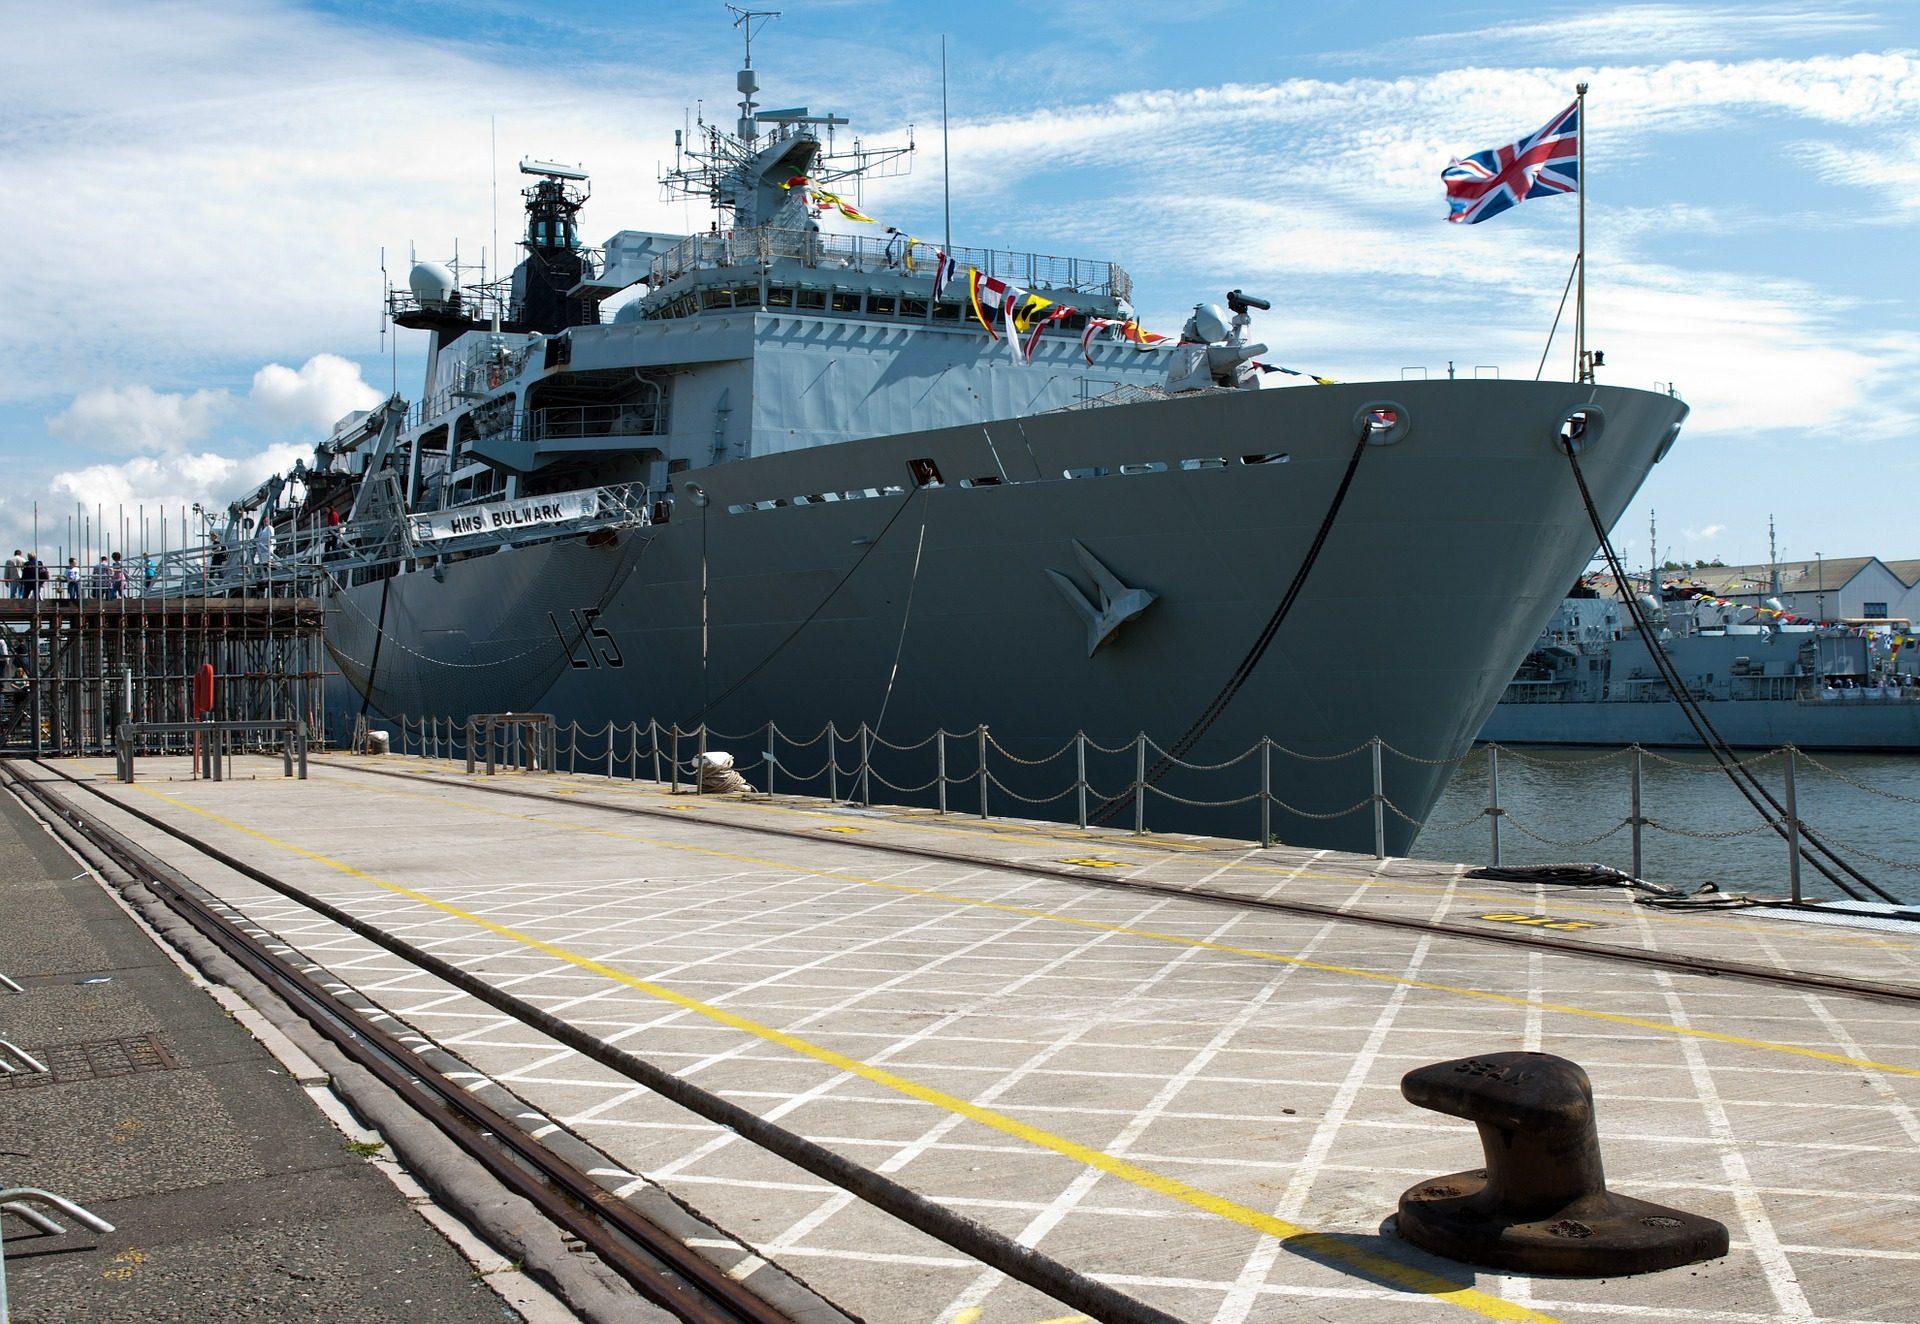 Boot, Schiff, Marina, Britische, Armee, Hafen, Anlegestelle - Wallpaper HD - Prof.-falken.com